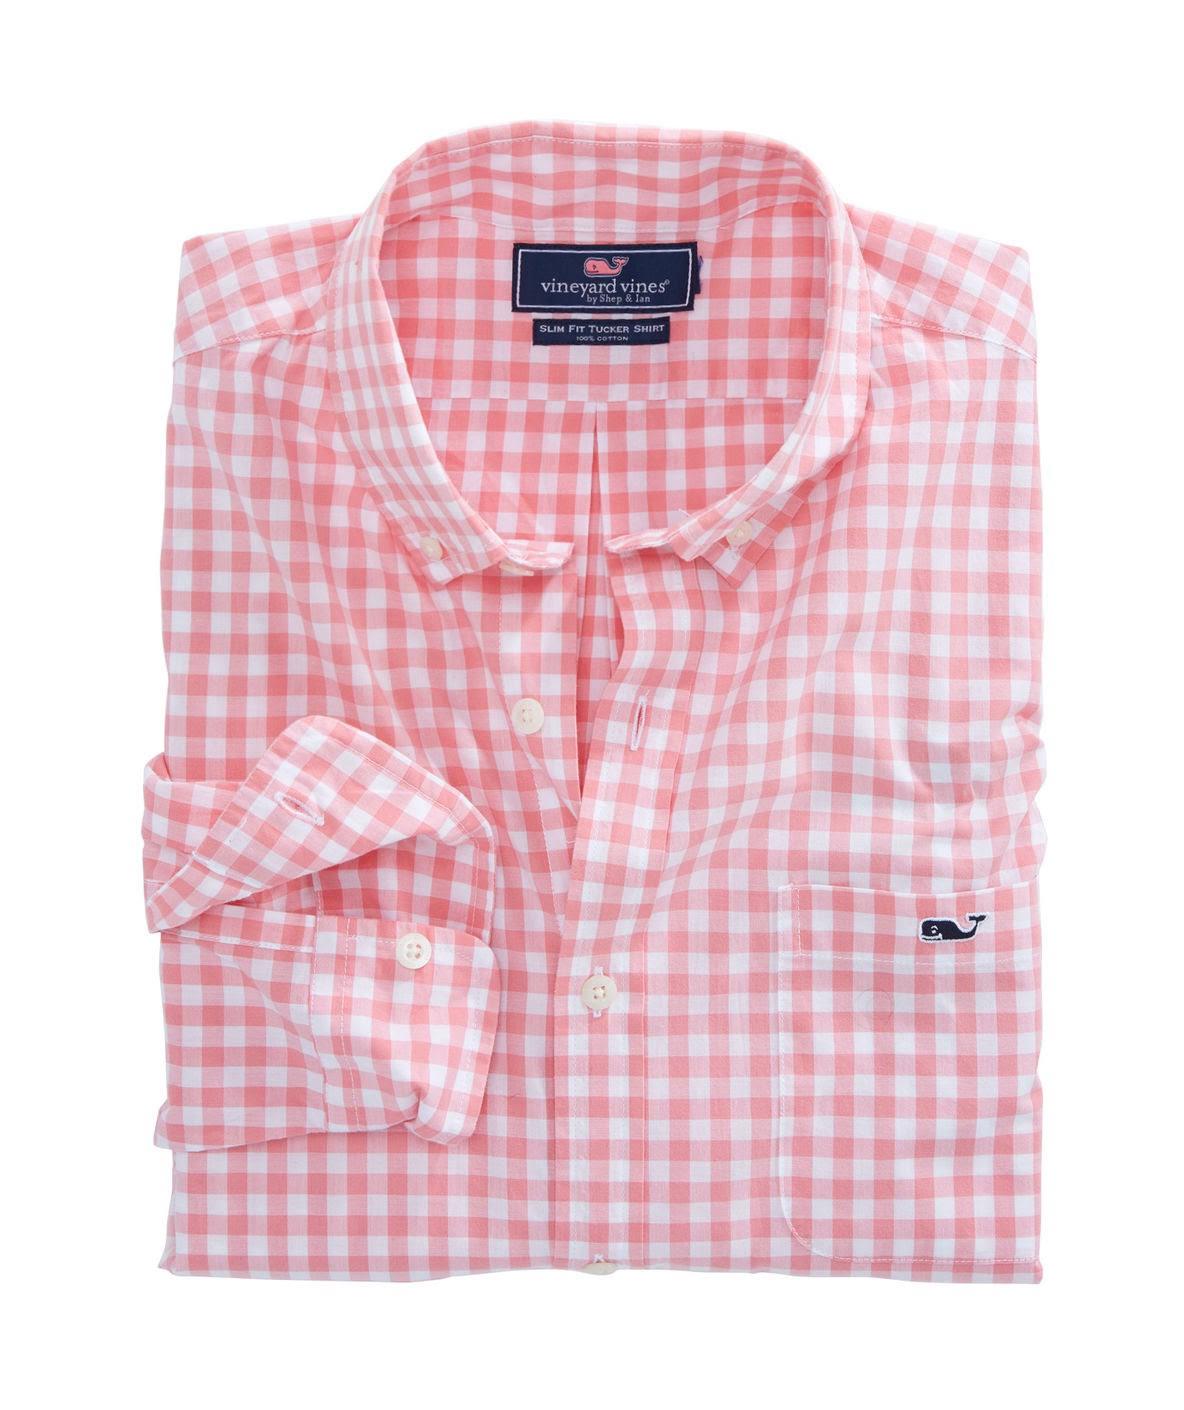 Spark Gingham Hullblue Vines shirt Vineyard Schmales Tucker Sea 1w3456 WBFnnSvwf